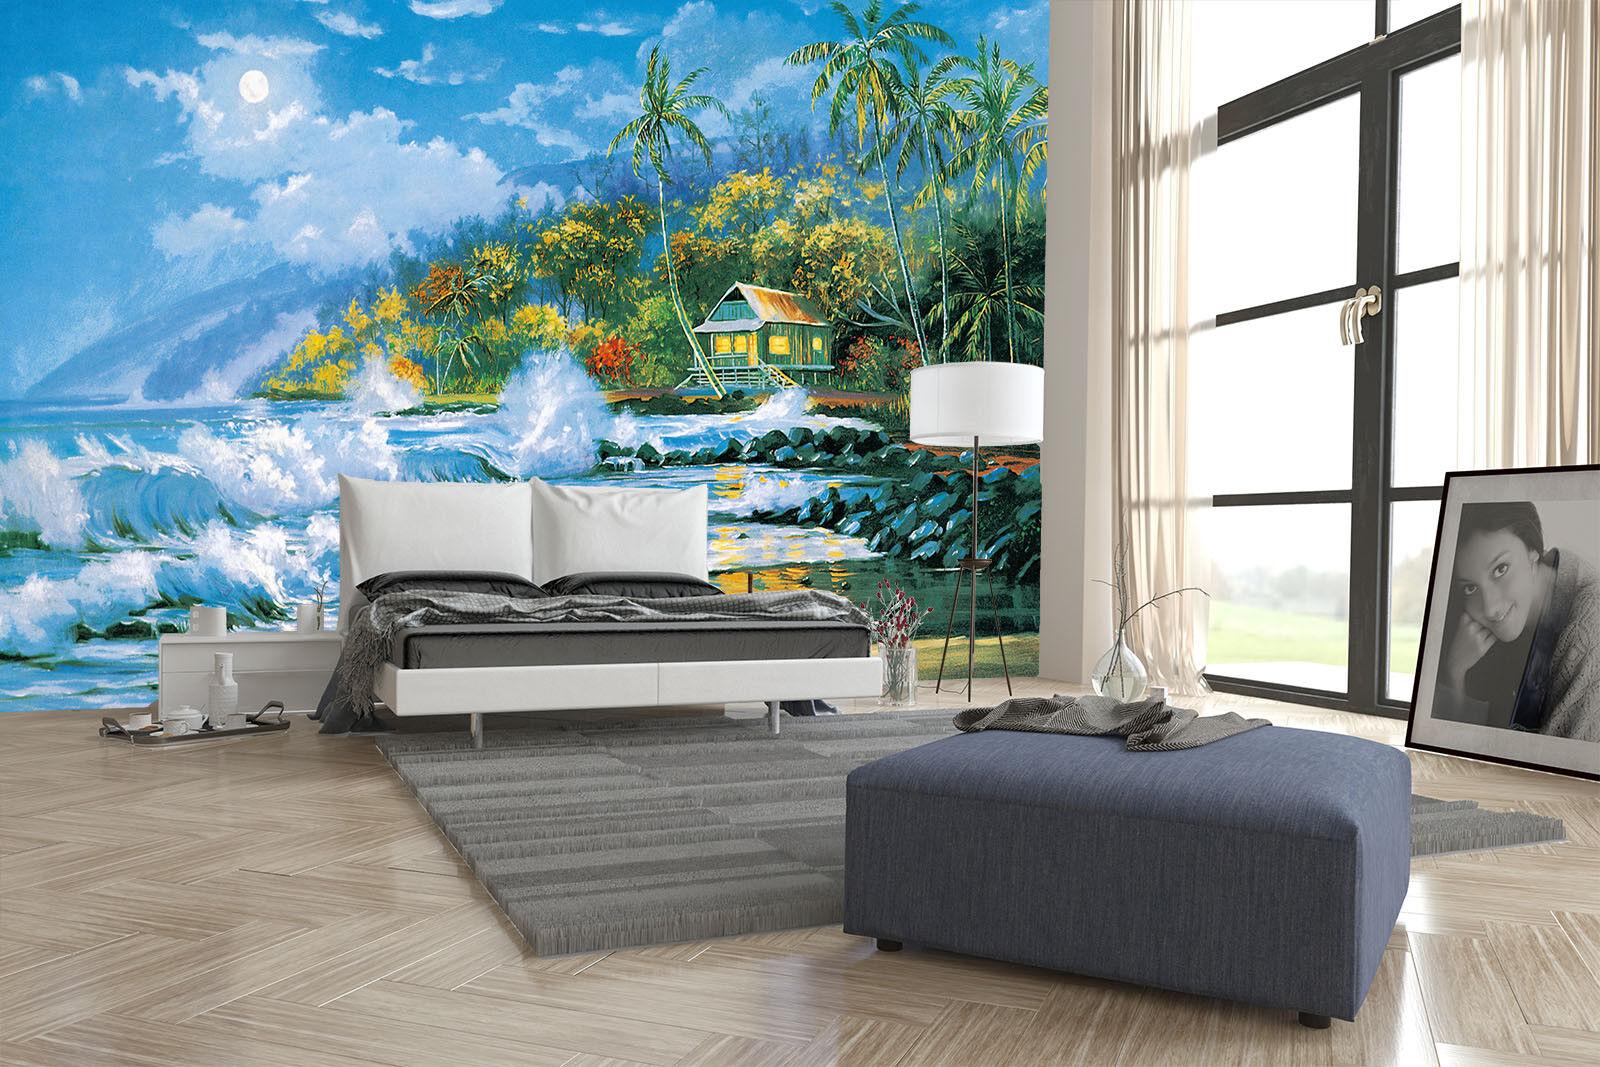 3D Meereswellen Strand 77 Tapete Wandgemälde Tapete Tapeten Bild Bild Bild Familie DE  | Kostengünstiger  | New Product 2019  | Deutschland Store  4b6e85